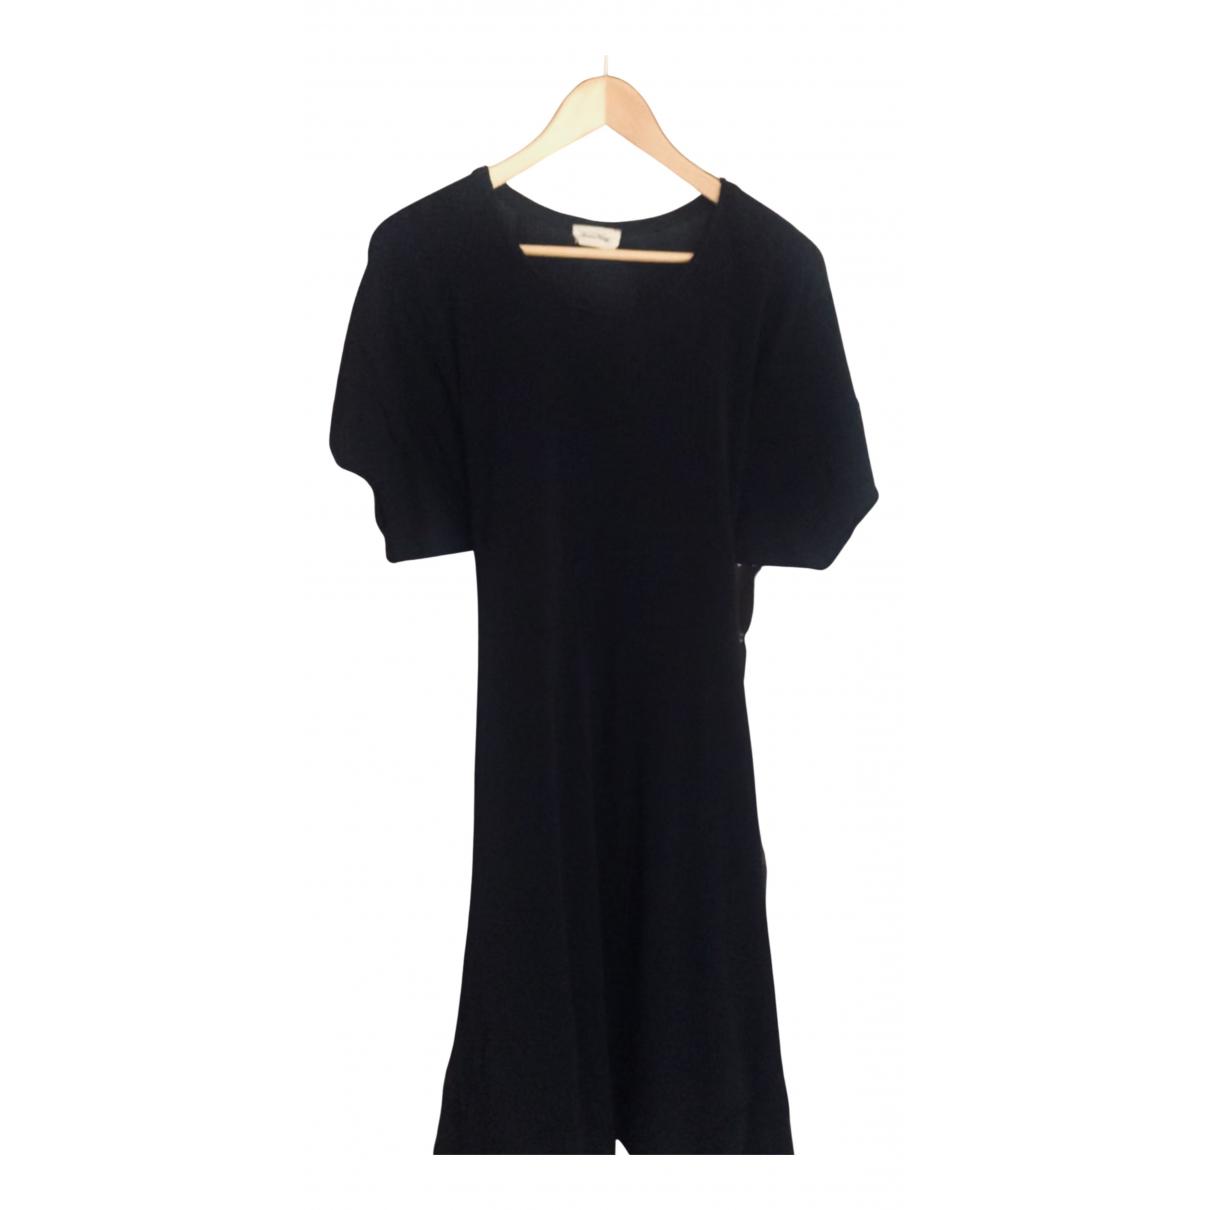 American Vintage - Robe   pour femme en coton - elasthane - noir